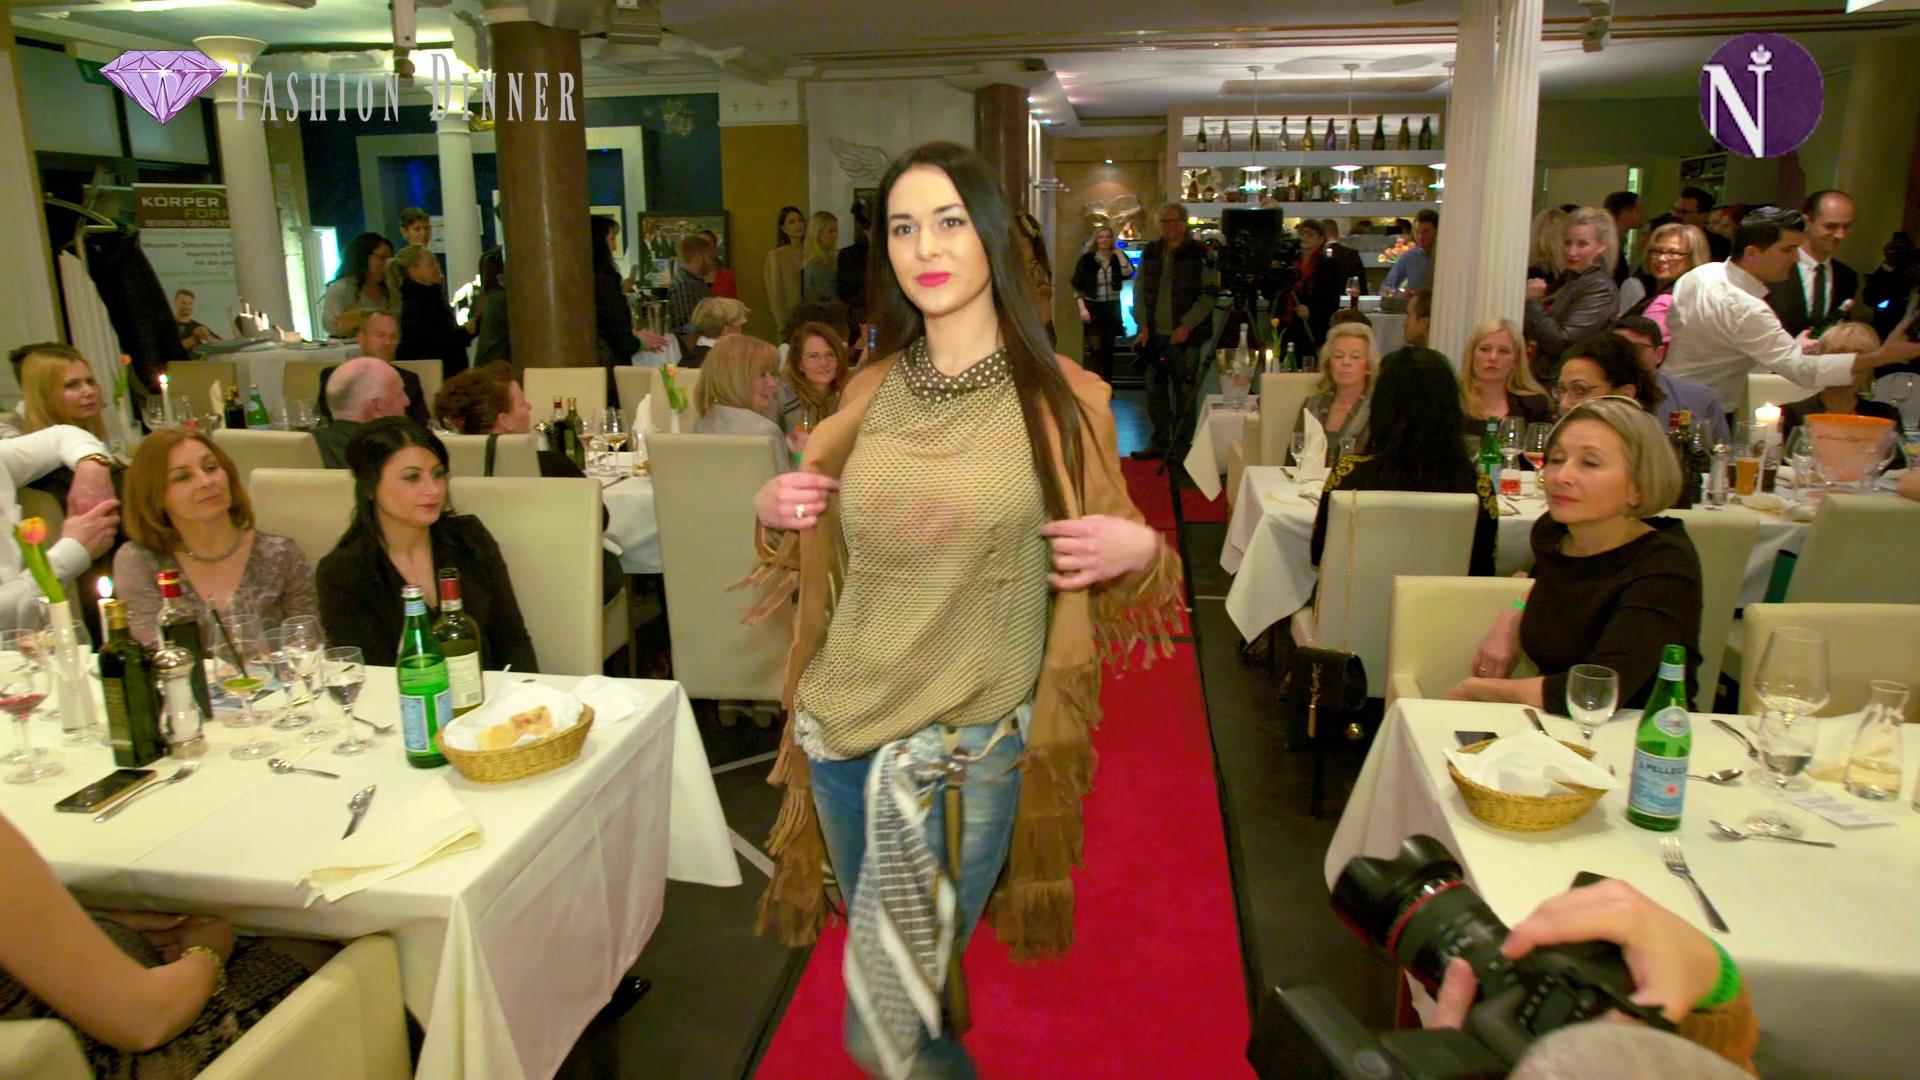 FASHION-DINNER   Nantia Persch